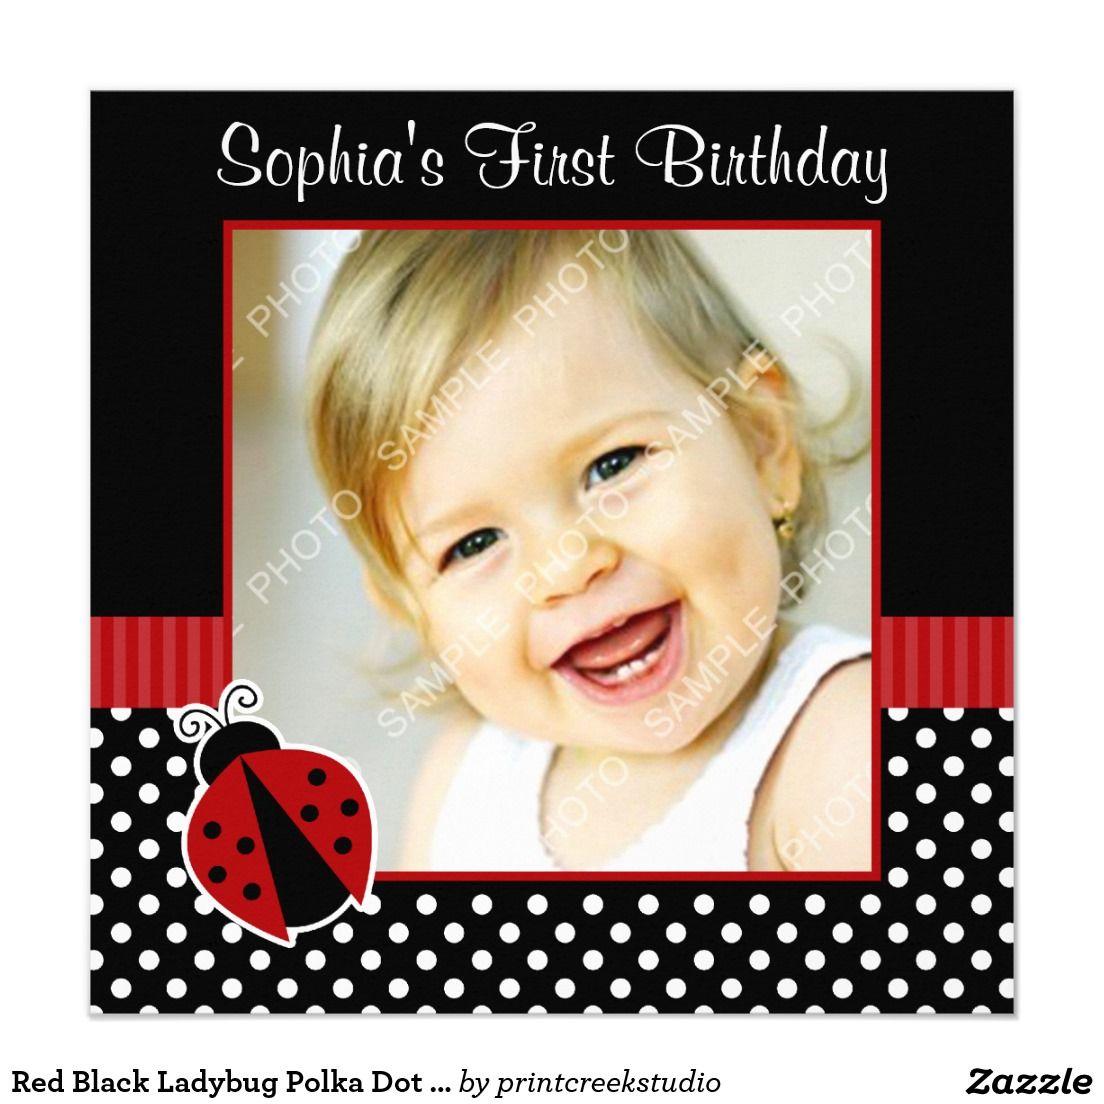 Red Black Ladybug Polka Dot 1st Birthday Photo Card Elena S First